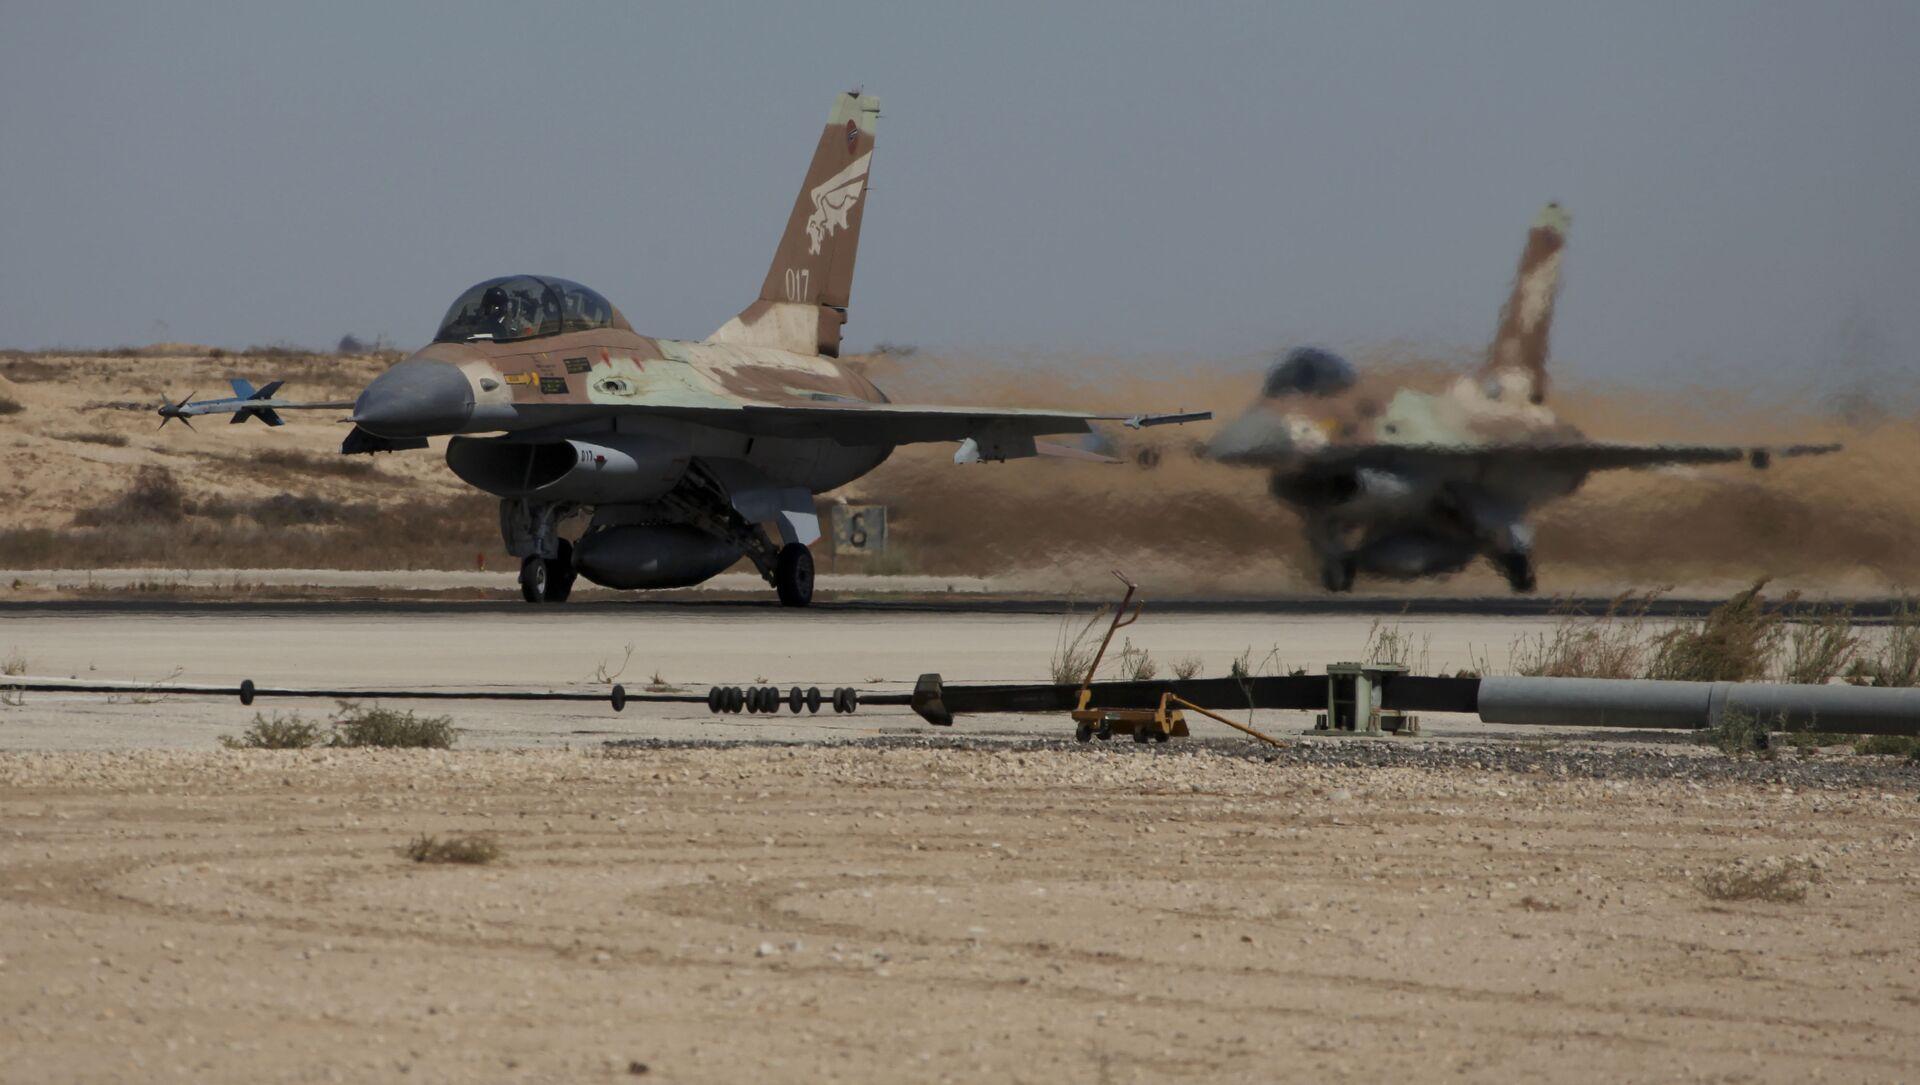 Israeli F-16a warplanes take off at the Nevatim air force base (File) - Sputnik International, 1920, 25.07.2021